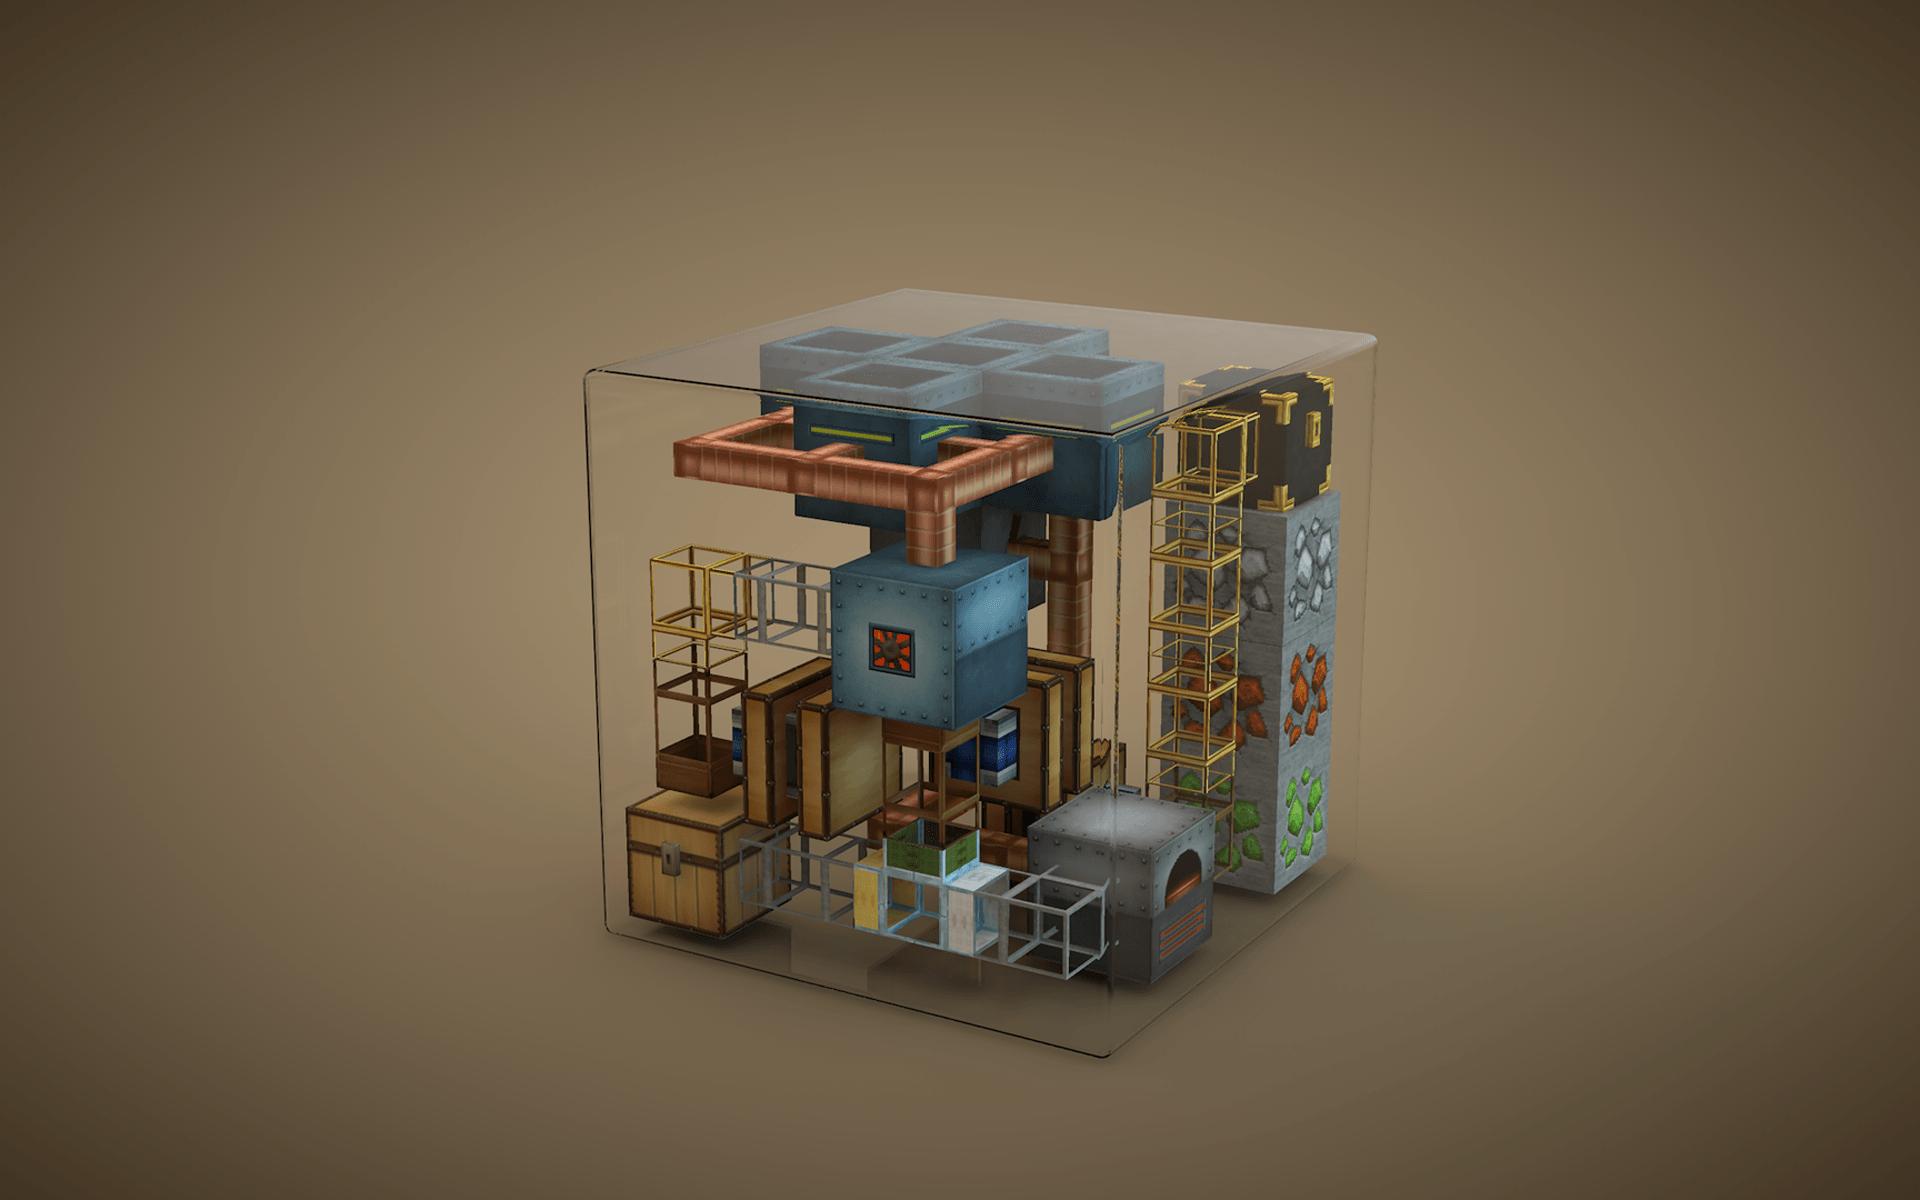 minecraft-17588